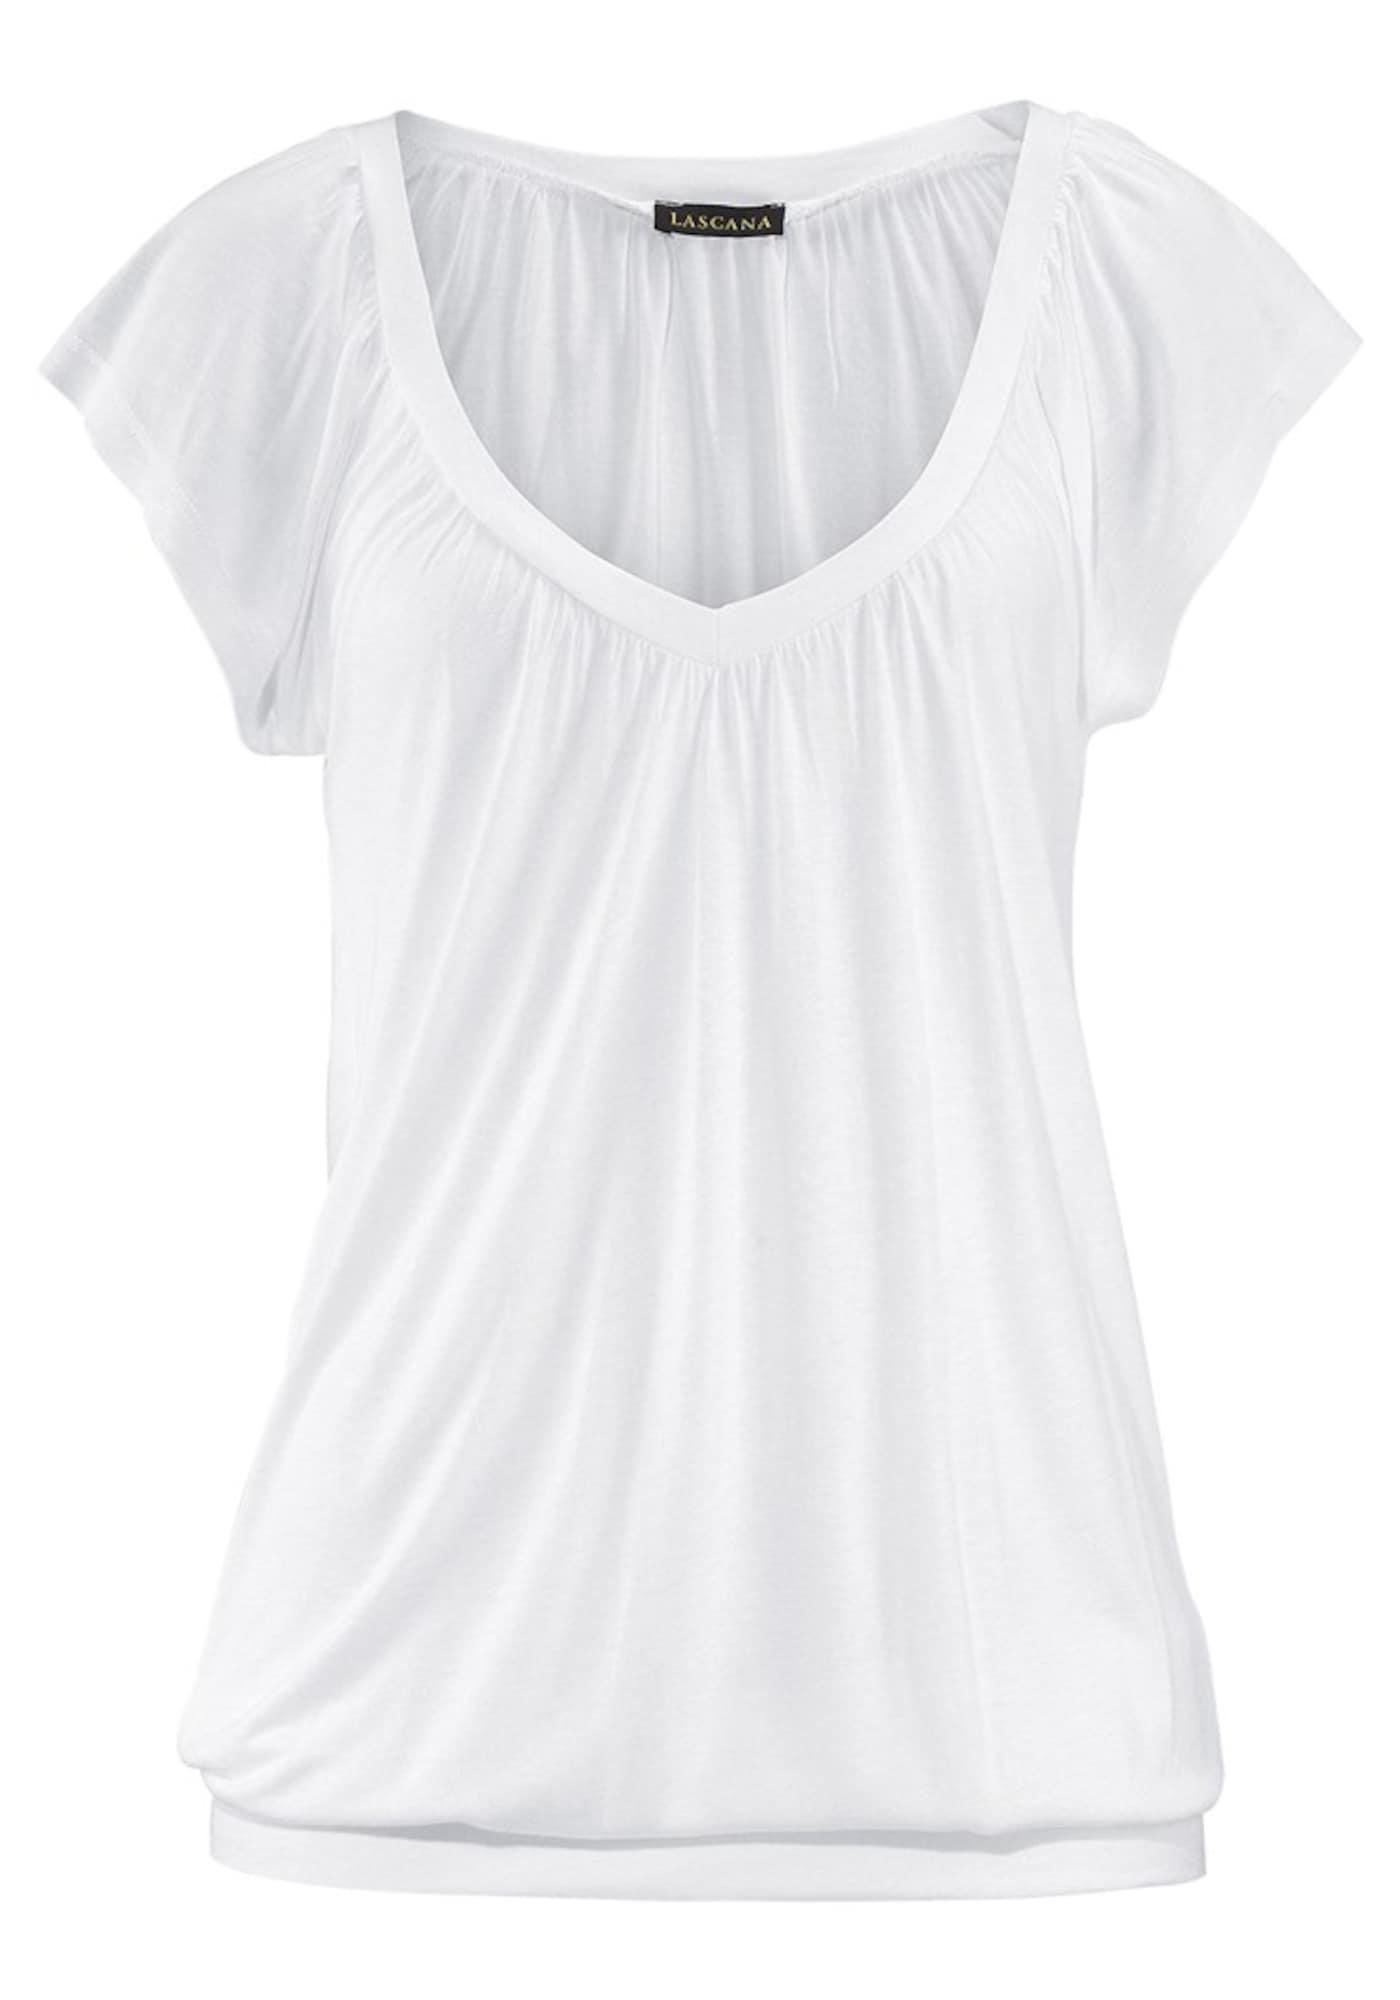 LASCANA, Dames Shirt, wit